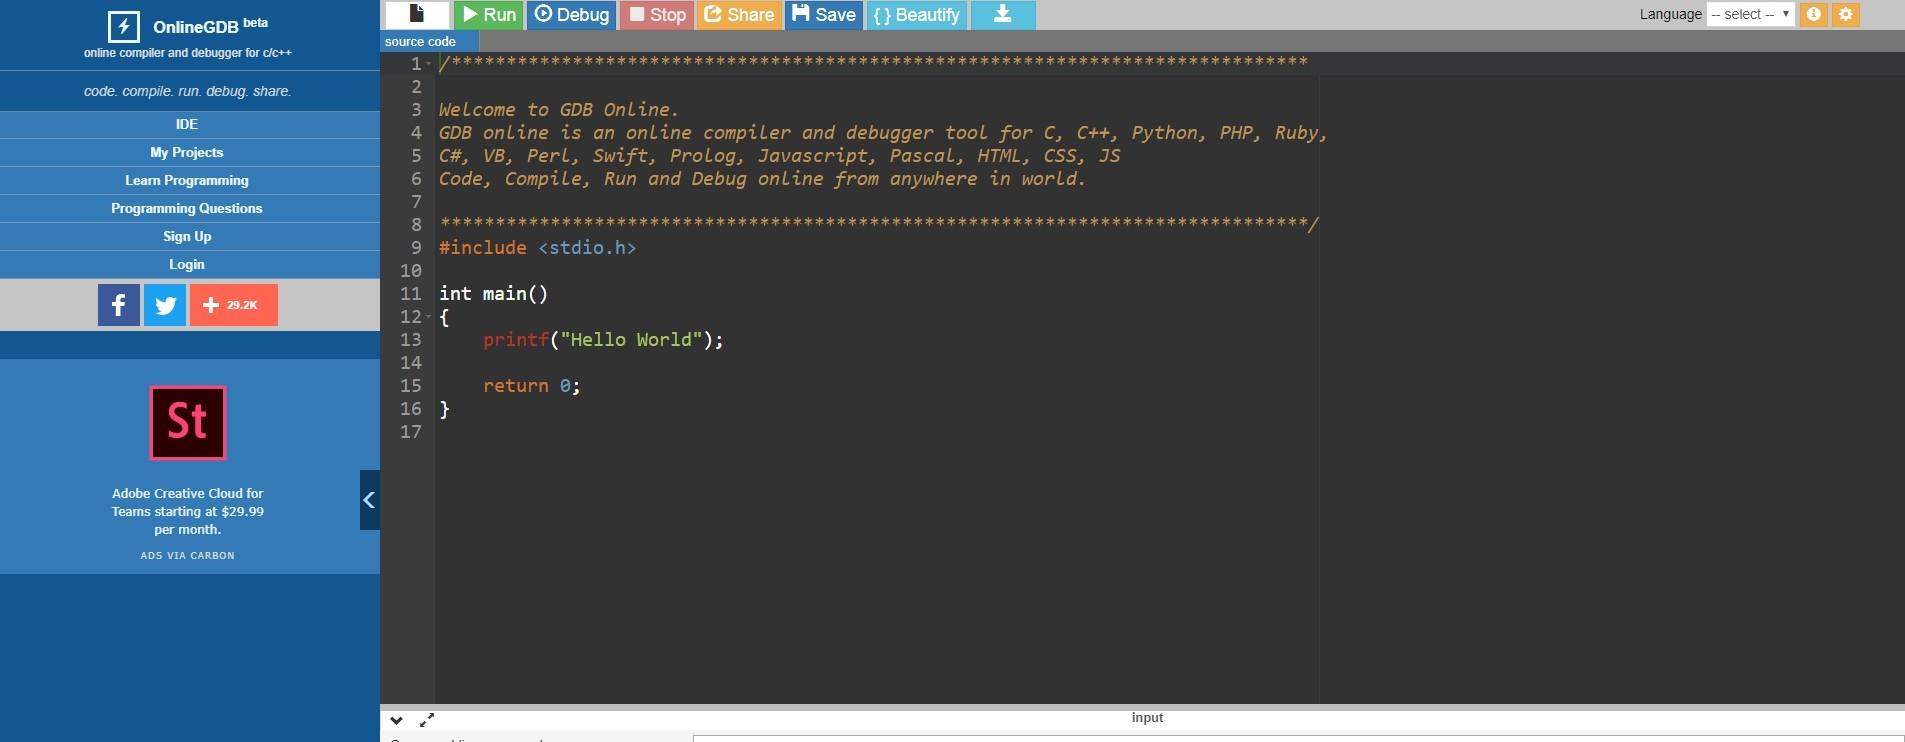 GDB online Debugger Compiler - компилятор кода